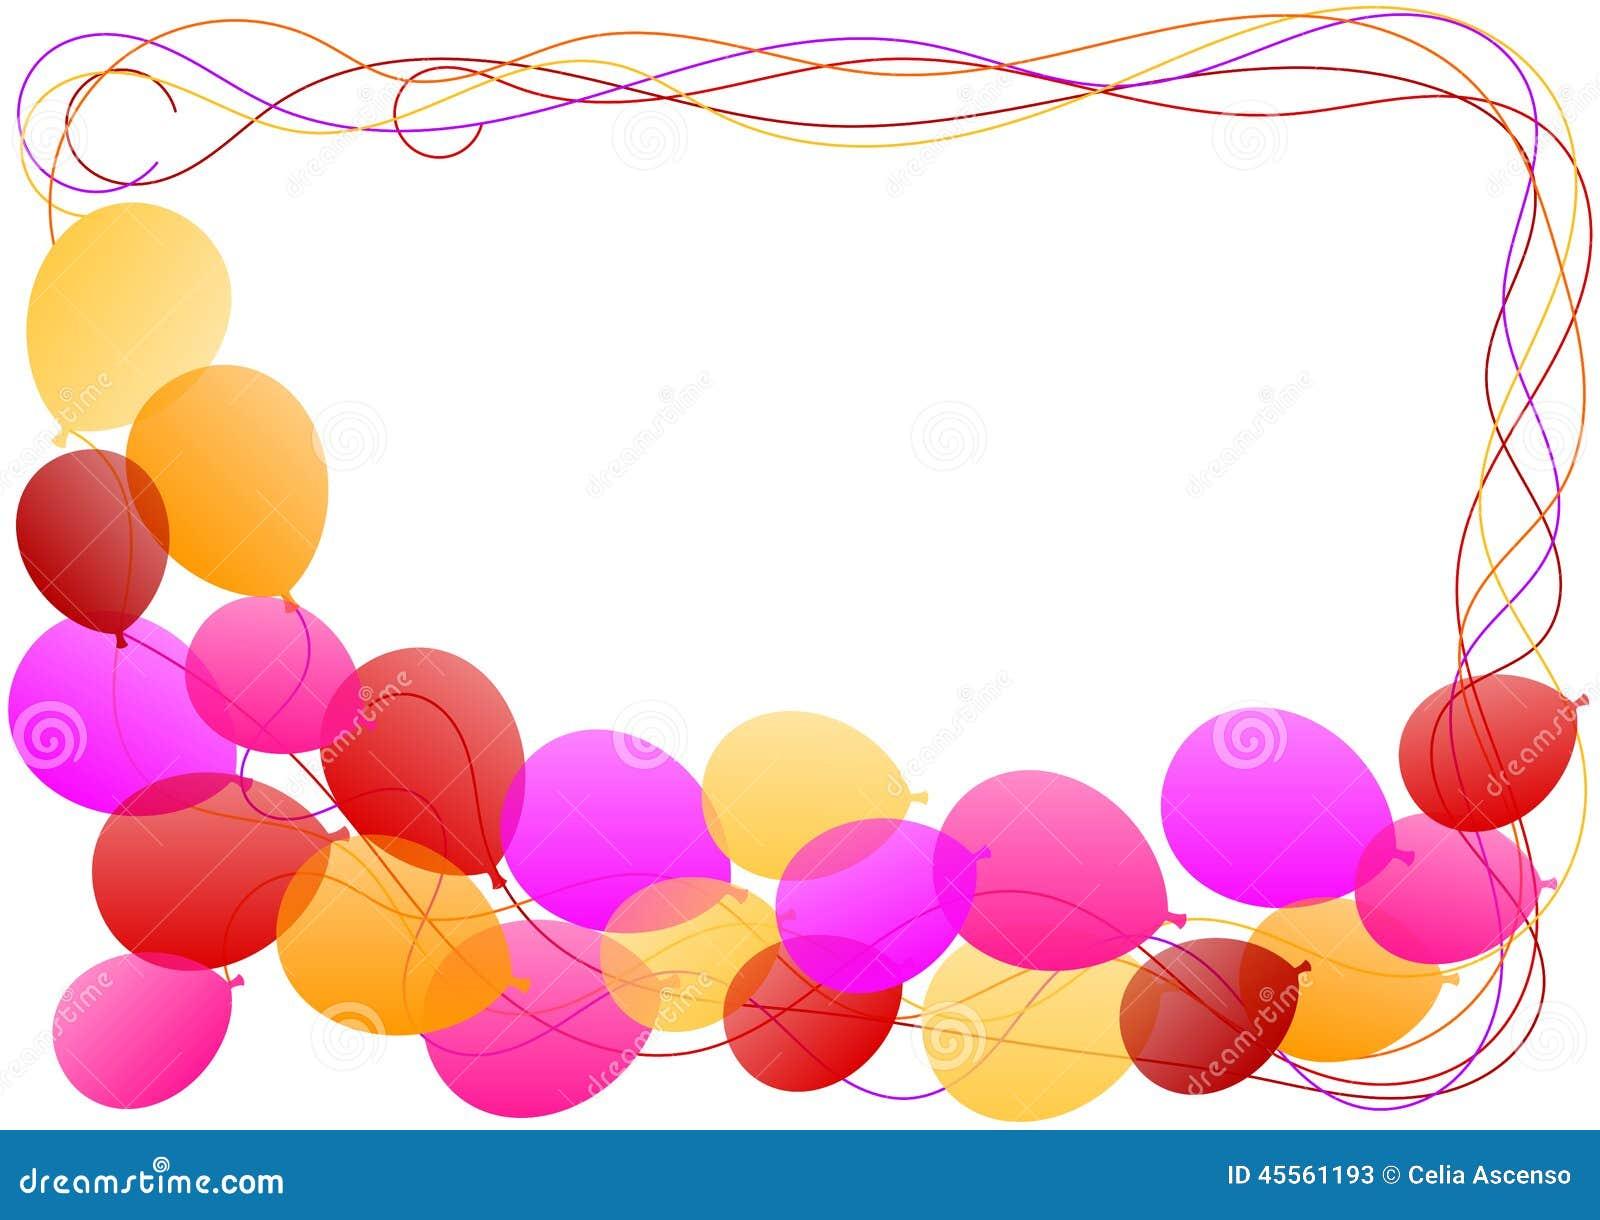 Balloon Birthday Invitation was amazing invitations example